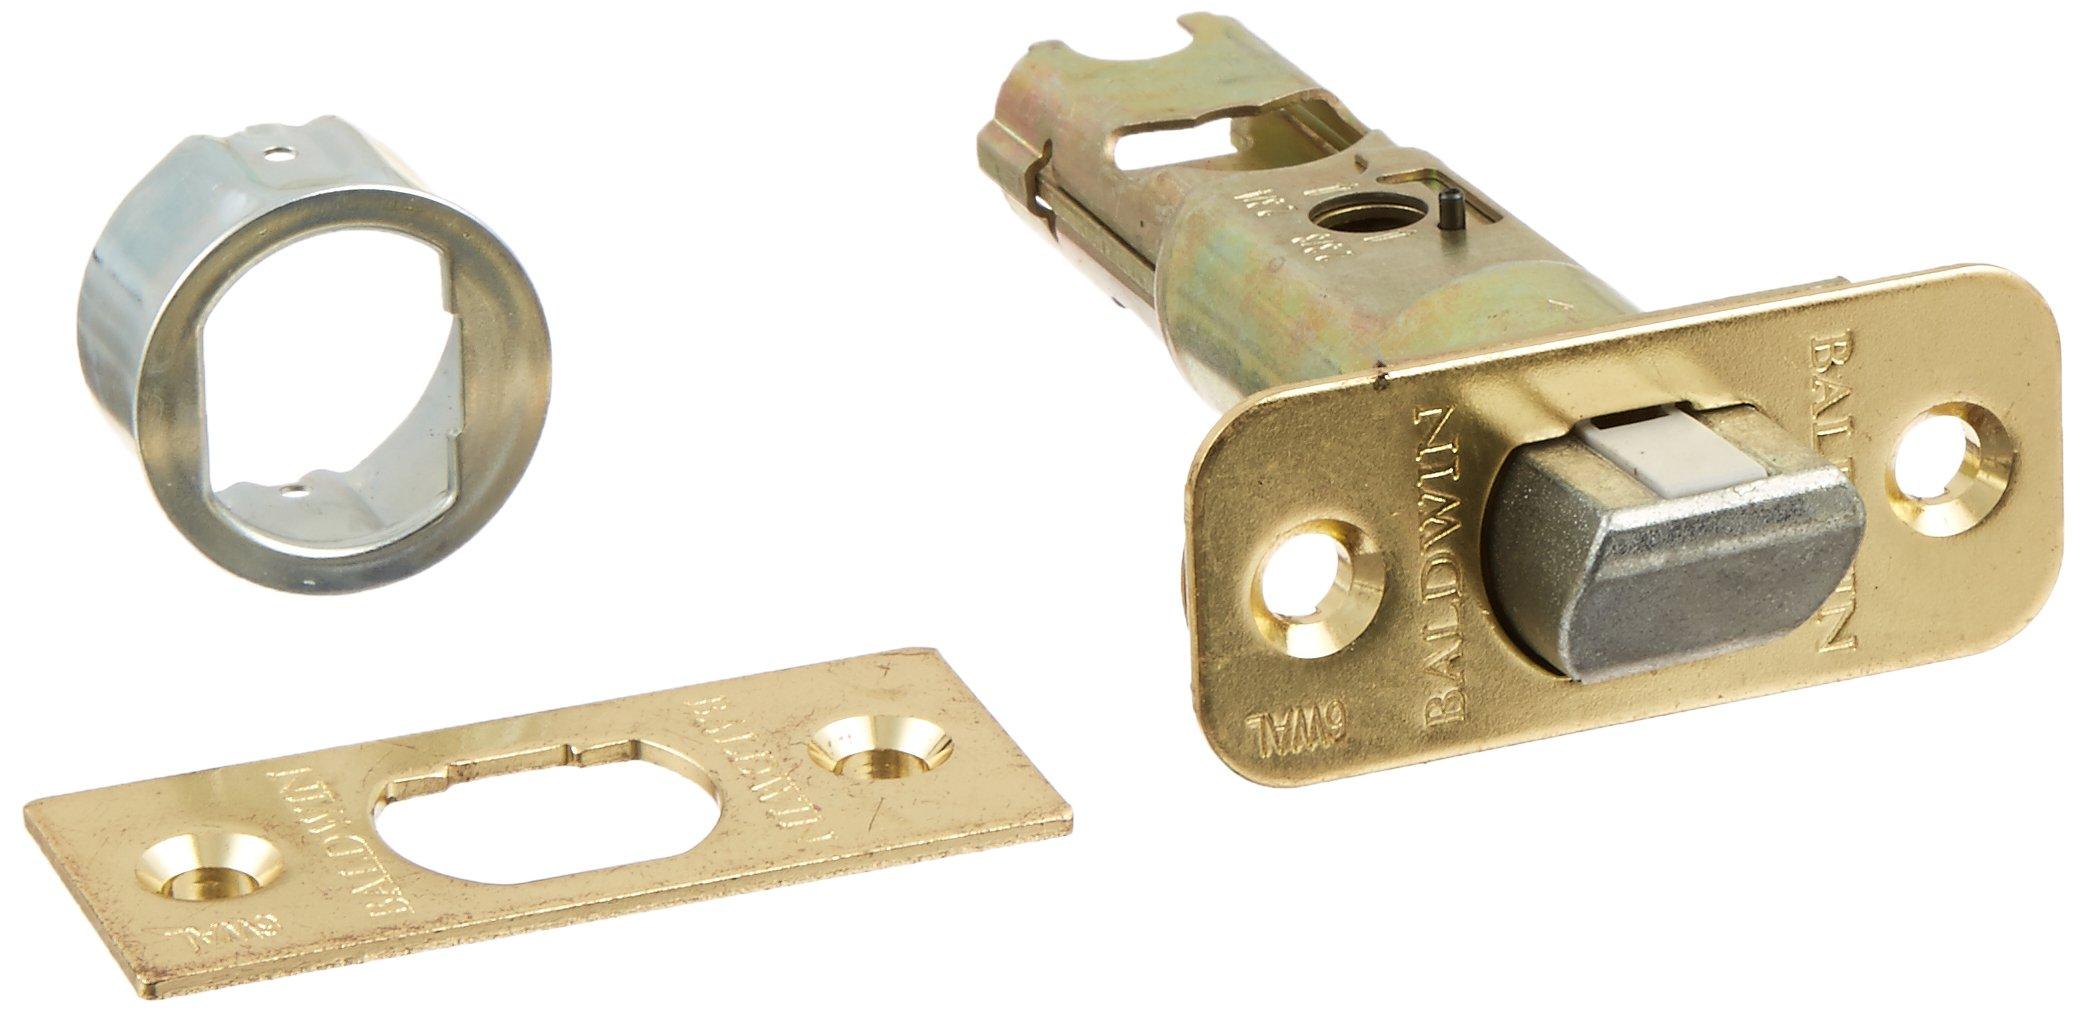 Kwikset 43034 6WAL PL SC 3 6-Way Adjustable Plain Latch in Polished Brass